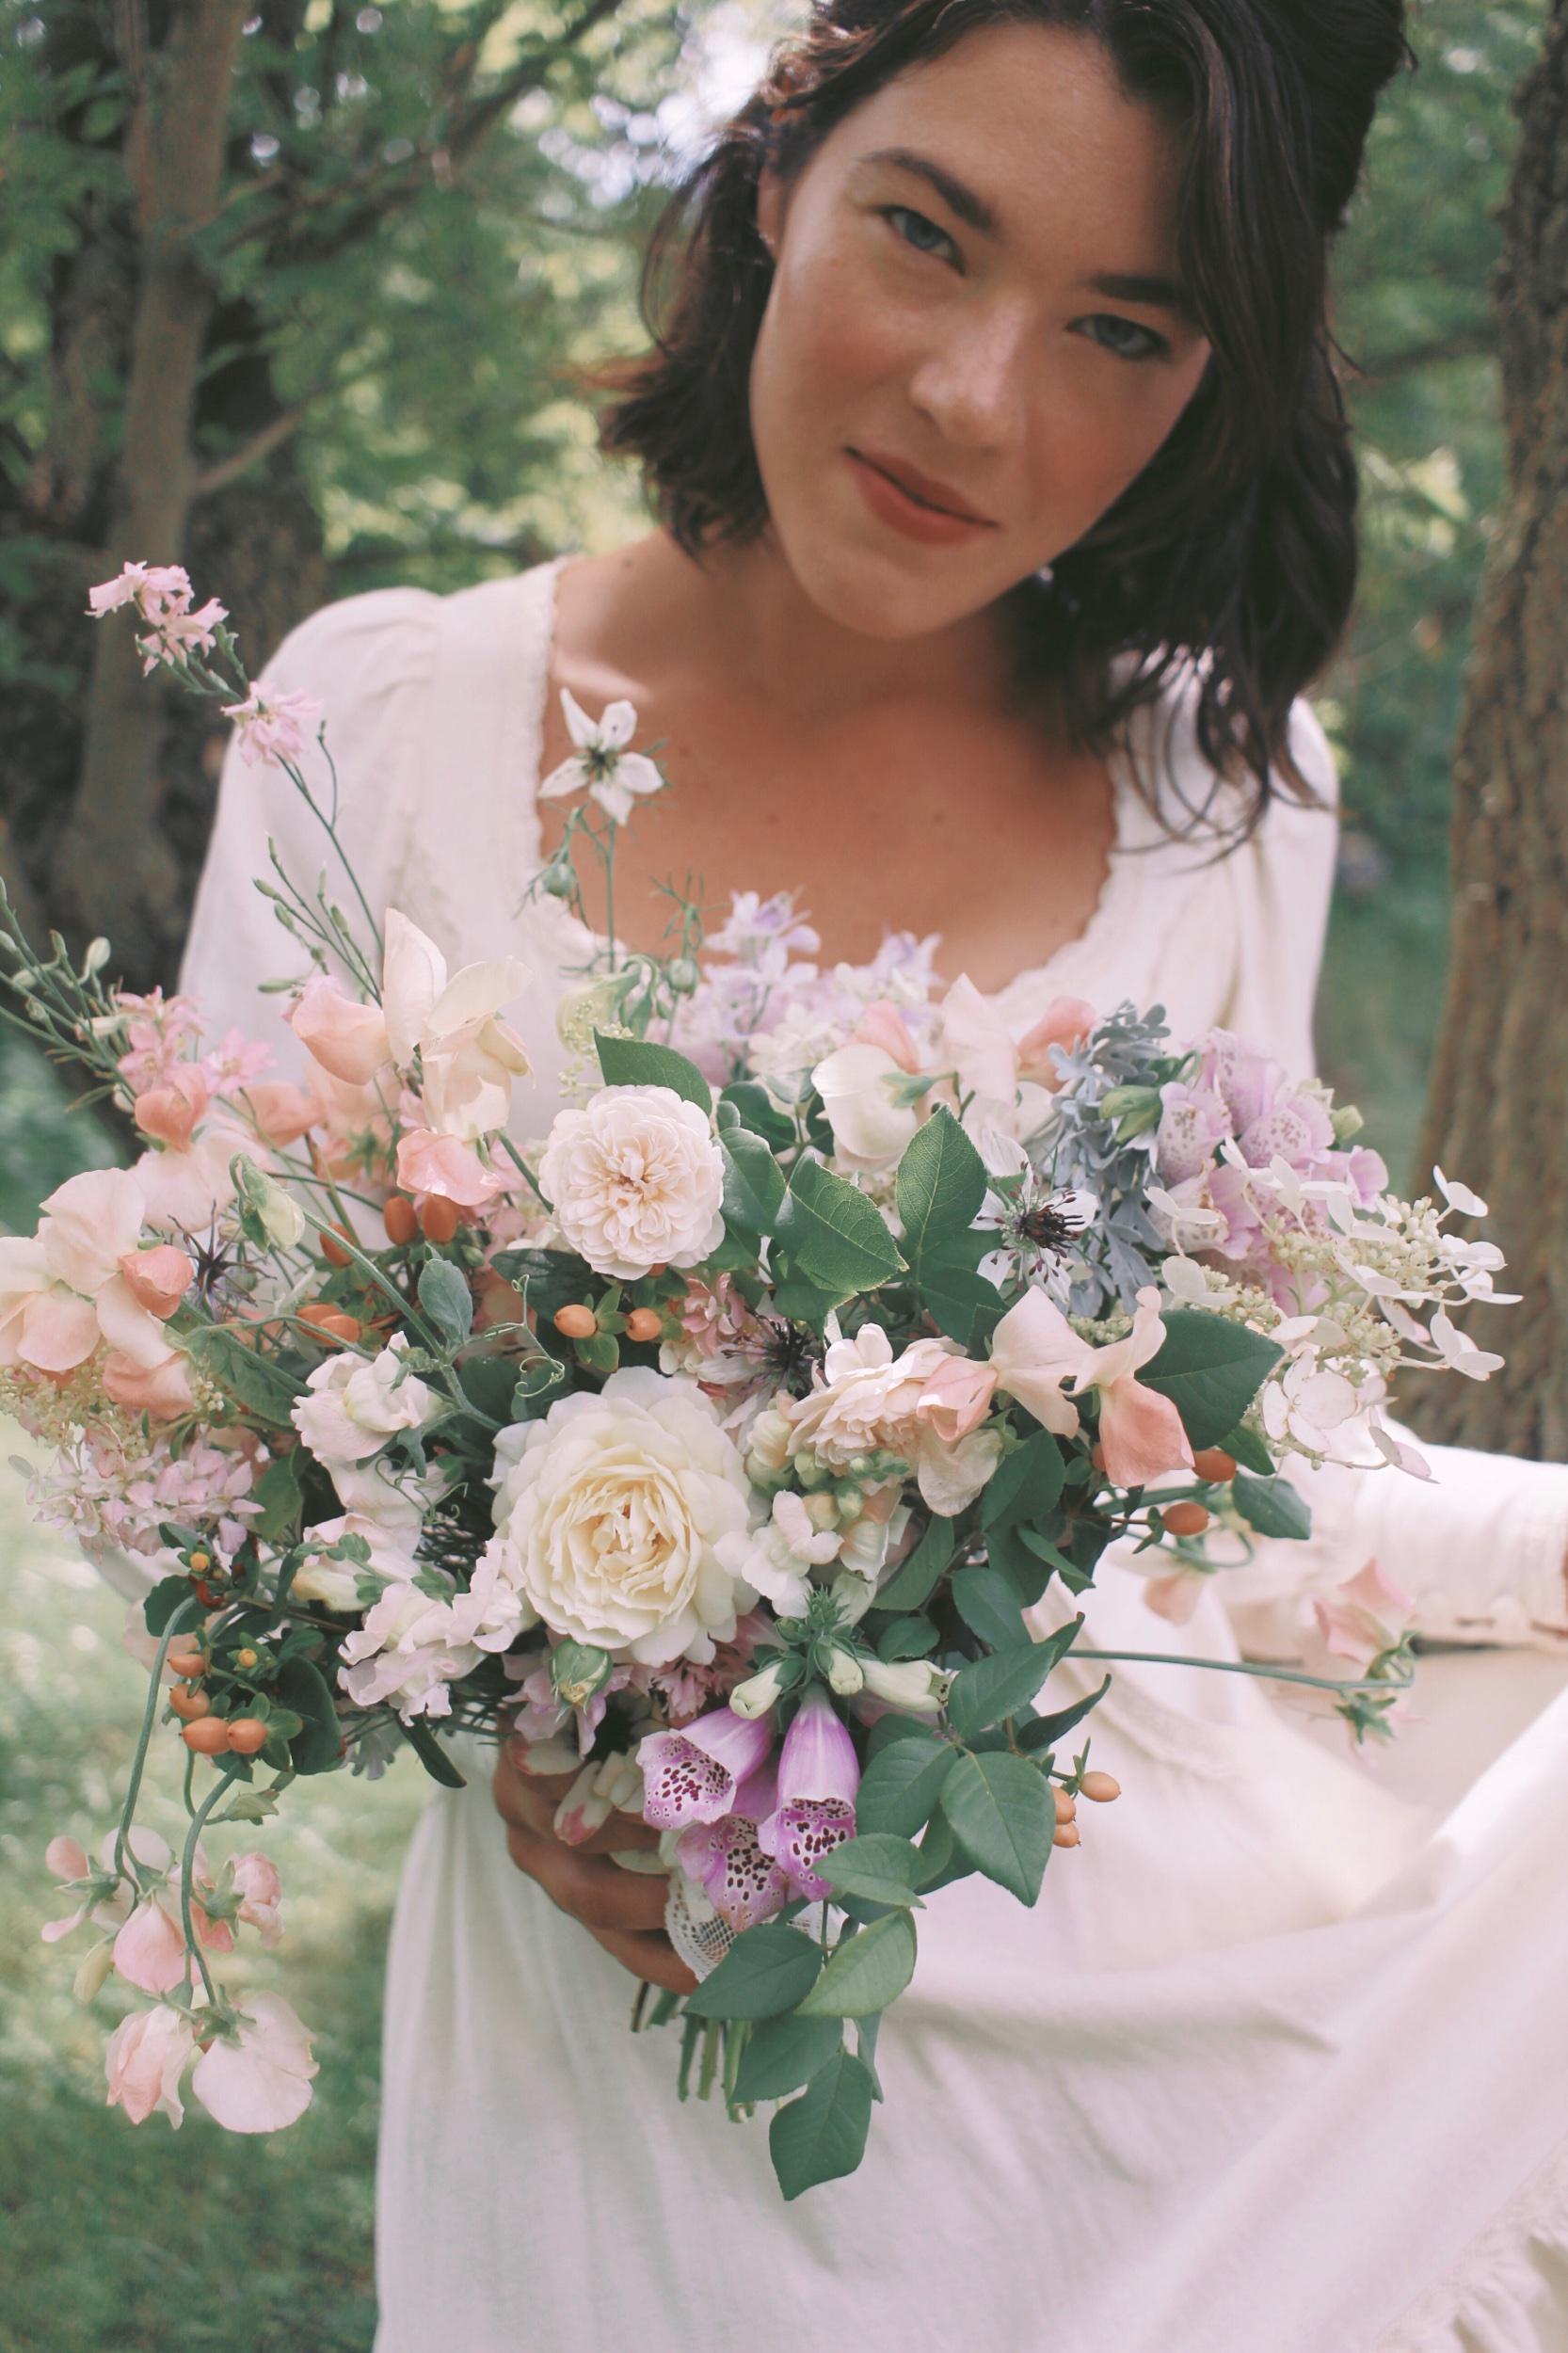 nostalgic, romantic, elemental, & wild — my flowers & I